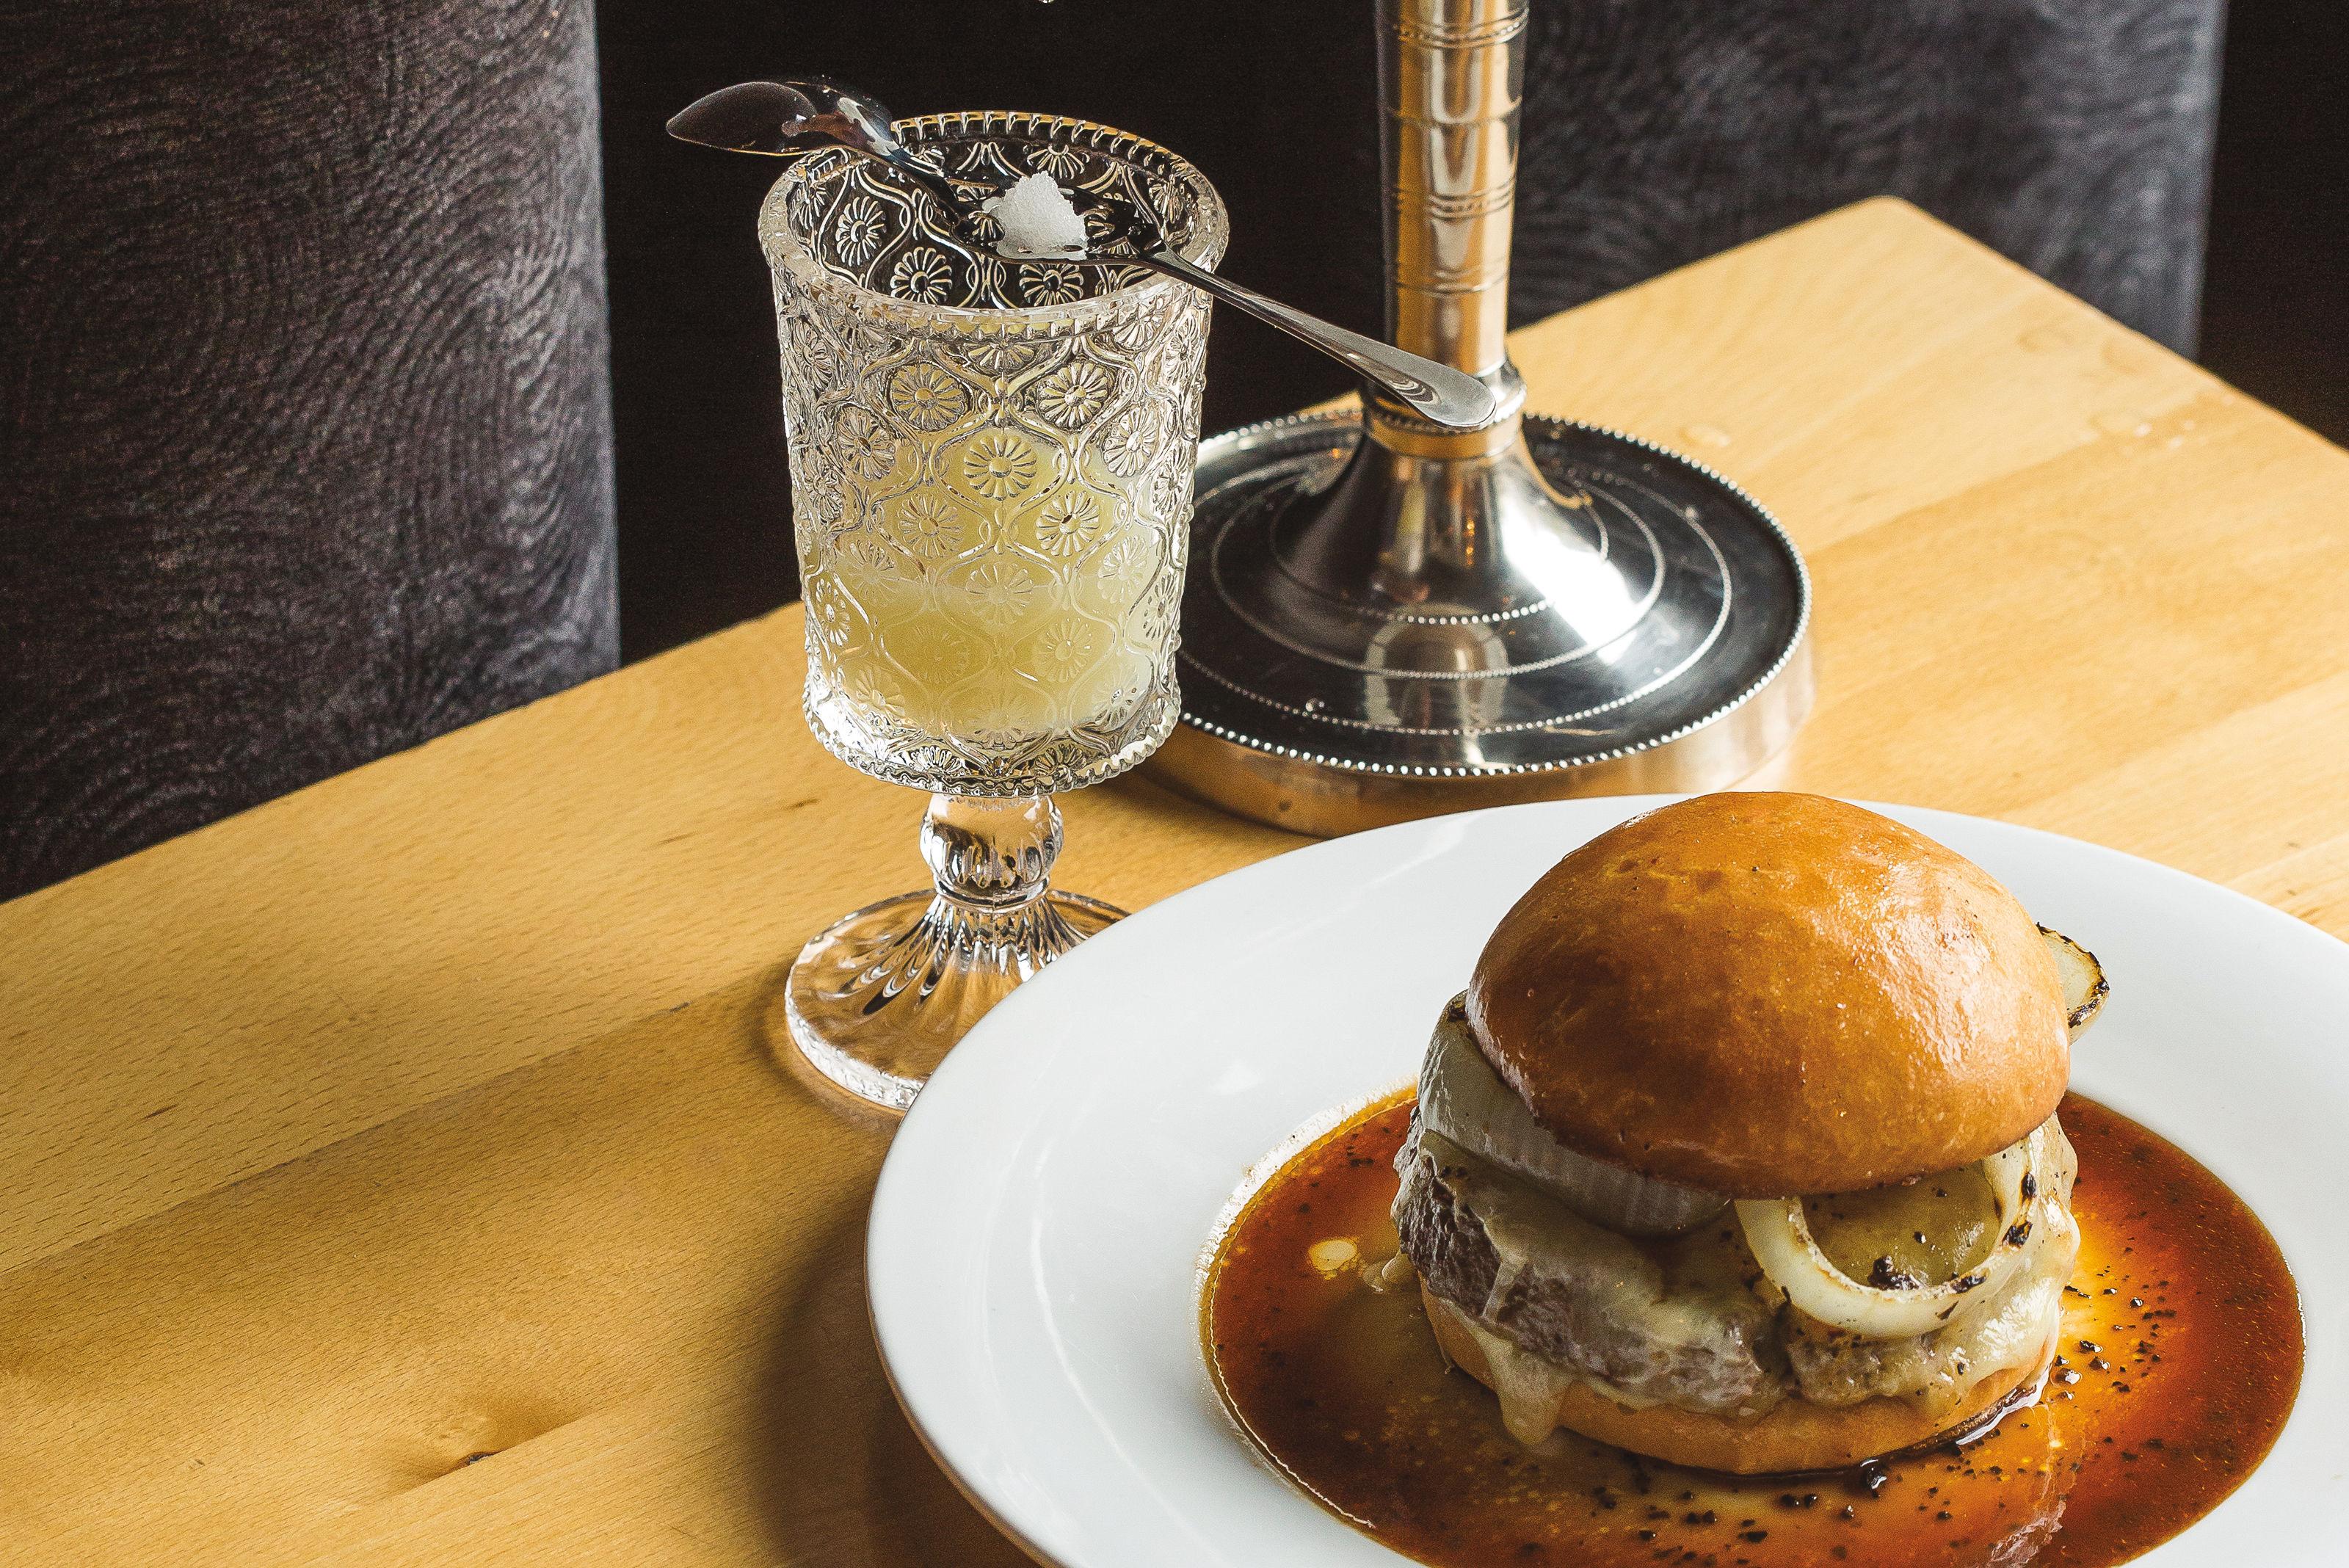 0618 eat bistro agnes burger k6ataz